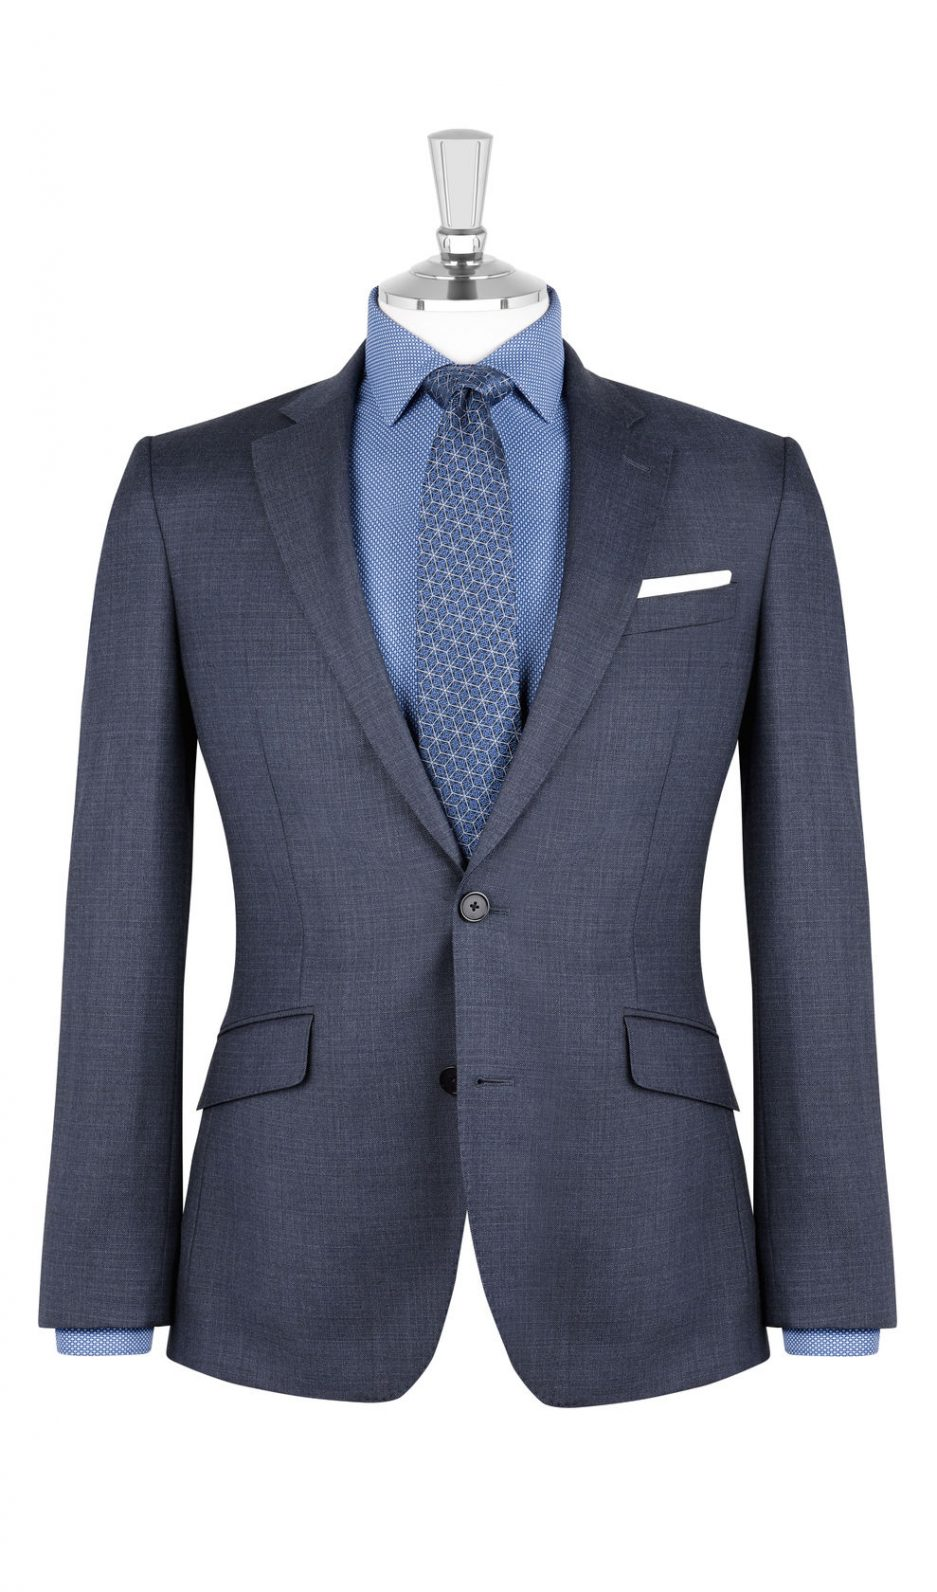 bespoke suit, ready to wear suit lagos nigeria